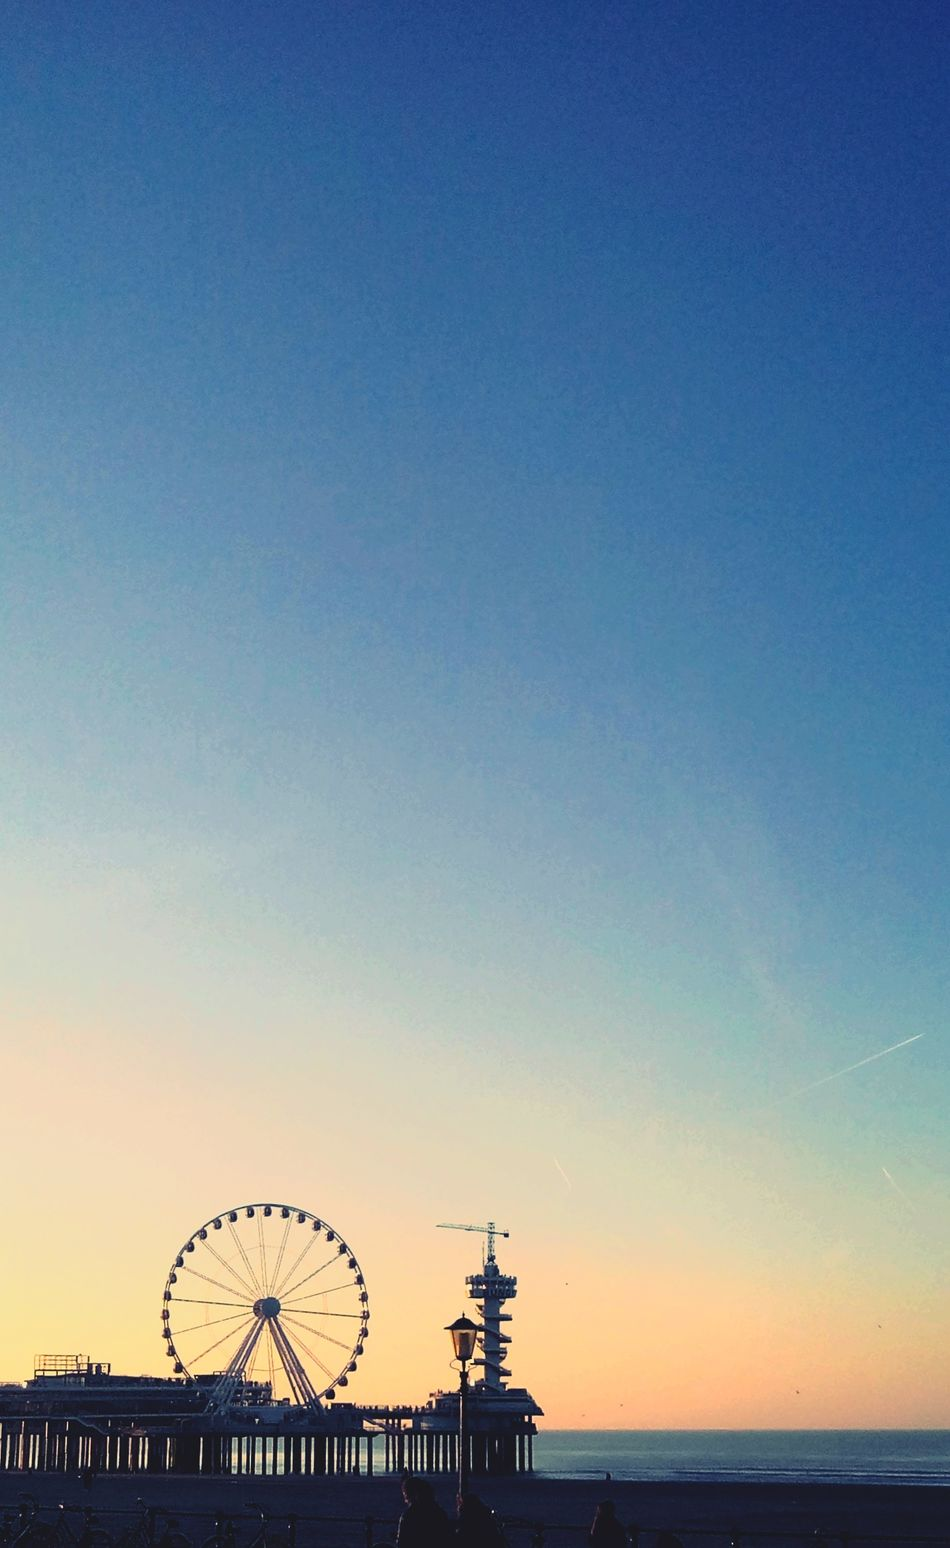 Beach Beauty Ferris Wheel Sea Amusement Park Rollercoaster Outdoors Sky No People Nature Scenics Day Eye4photography  Clear Sky Travel Destinations EyeEm Best Shots - Landscape Eyeemphotography EyeEmNewHere Tranquility Nature Photography Dutch Sunset